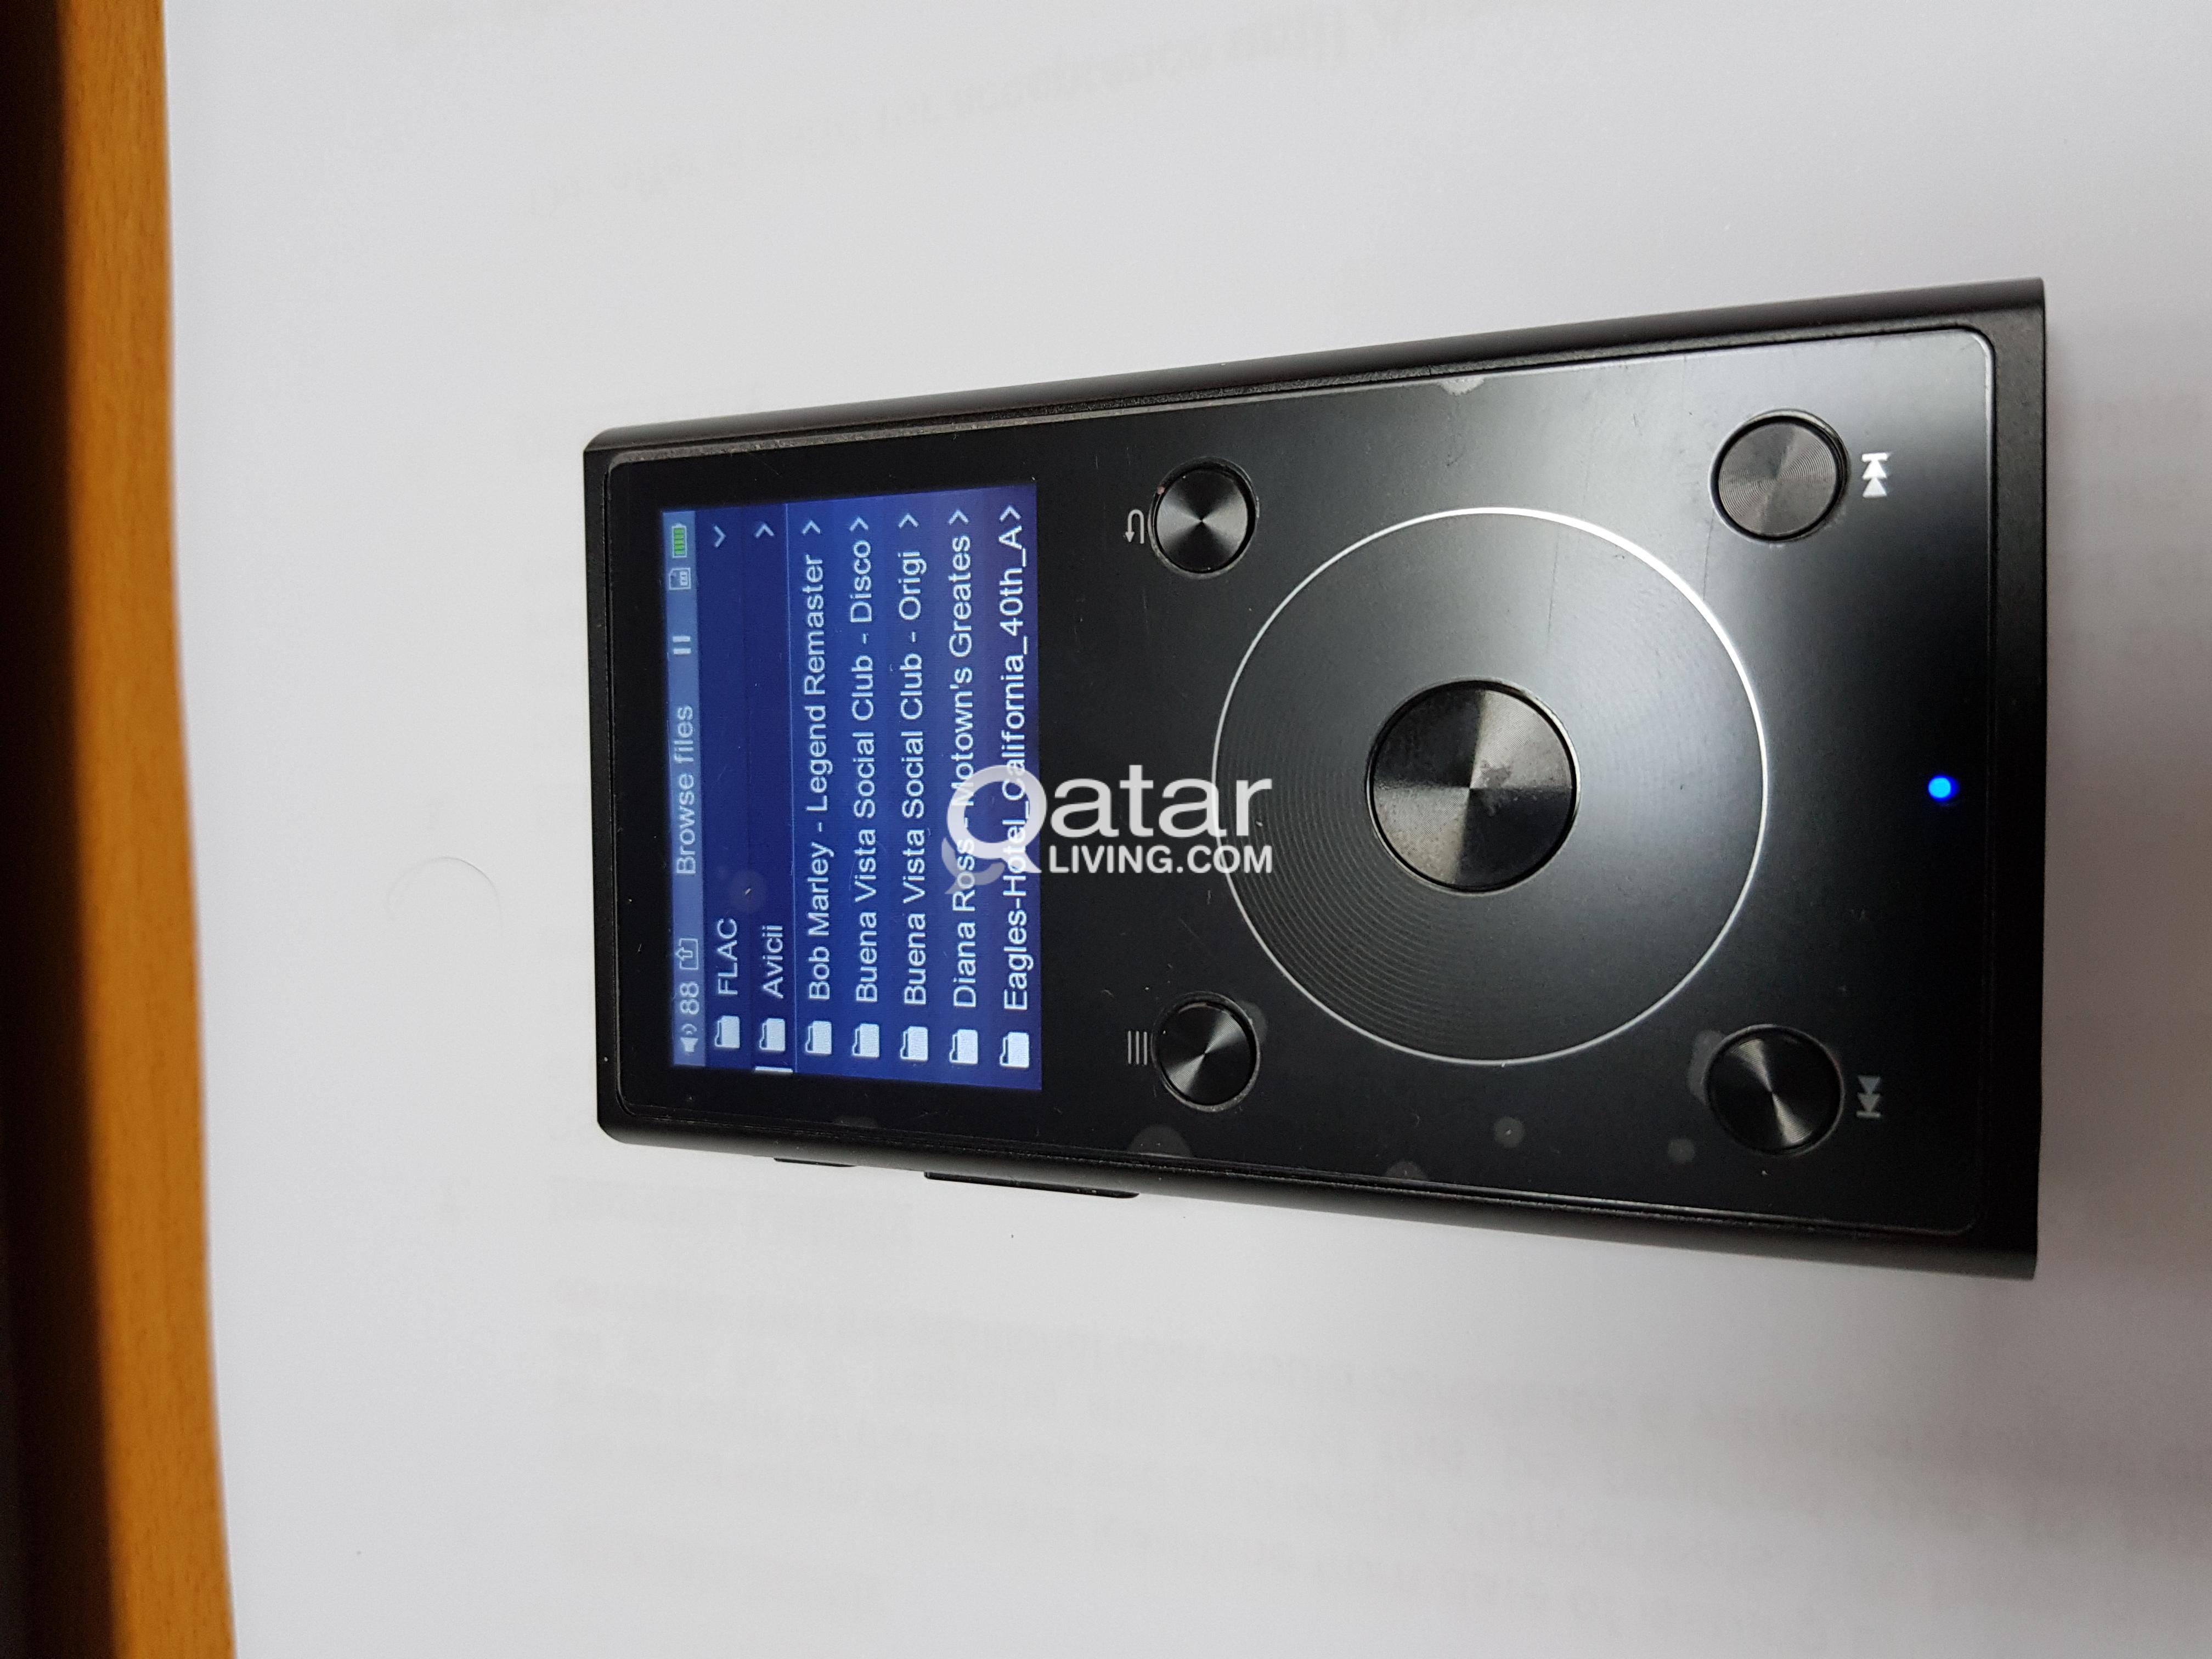 FiiO X1 (200GB) 2nd Gen High Definition Music Player | Qatar Living